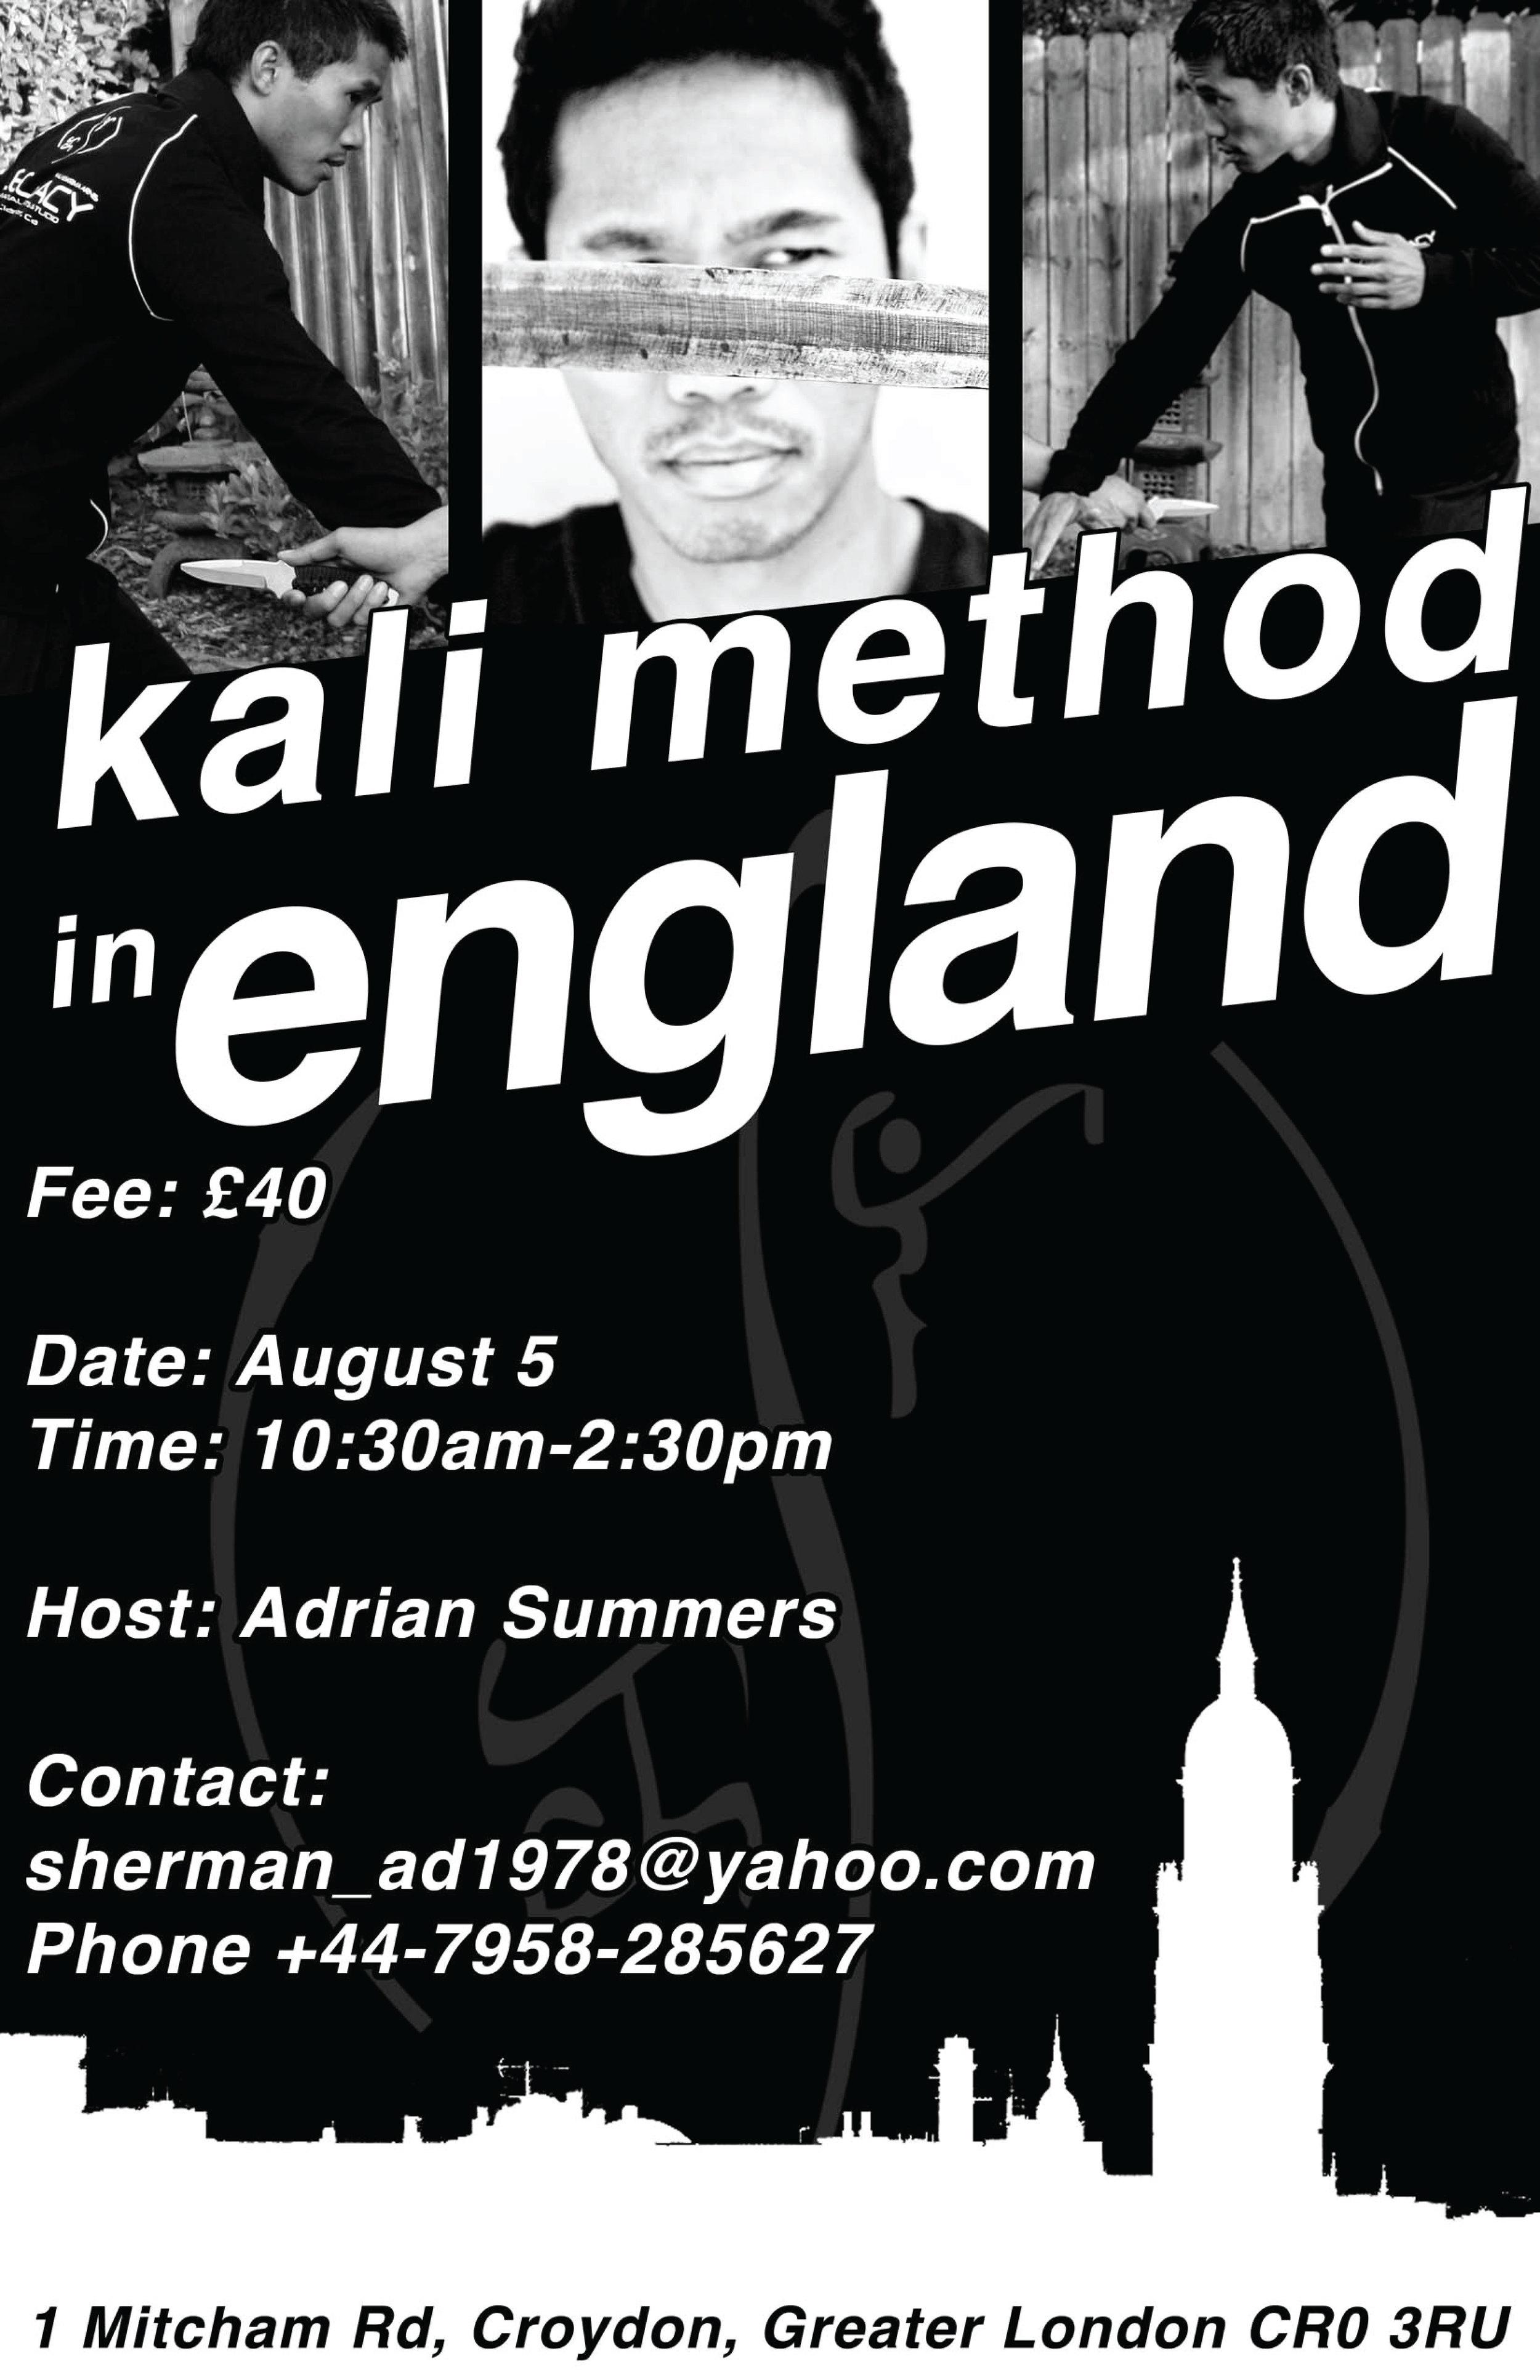 england seminar flyer 2012 11x17.jpg